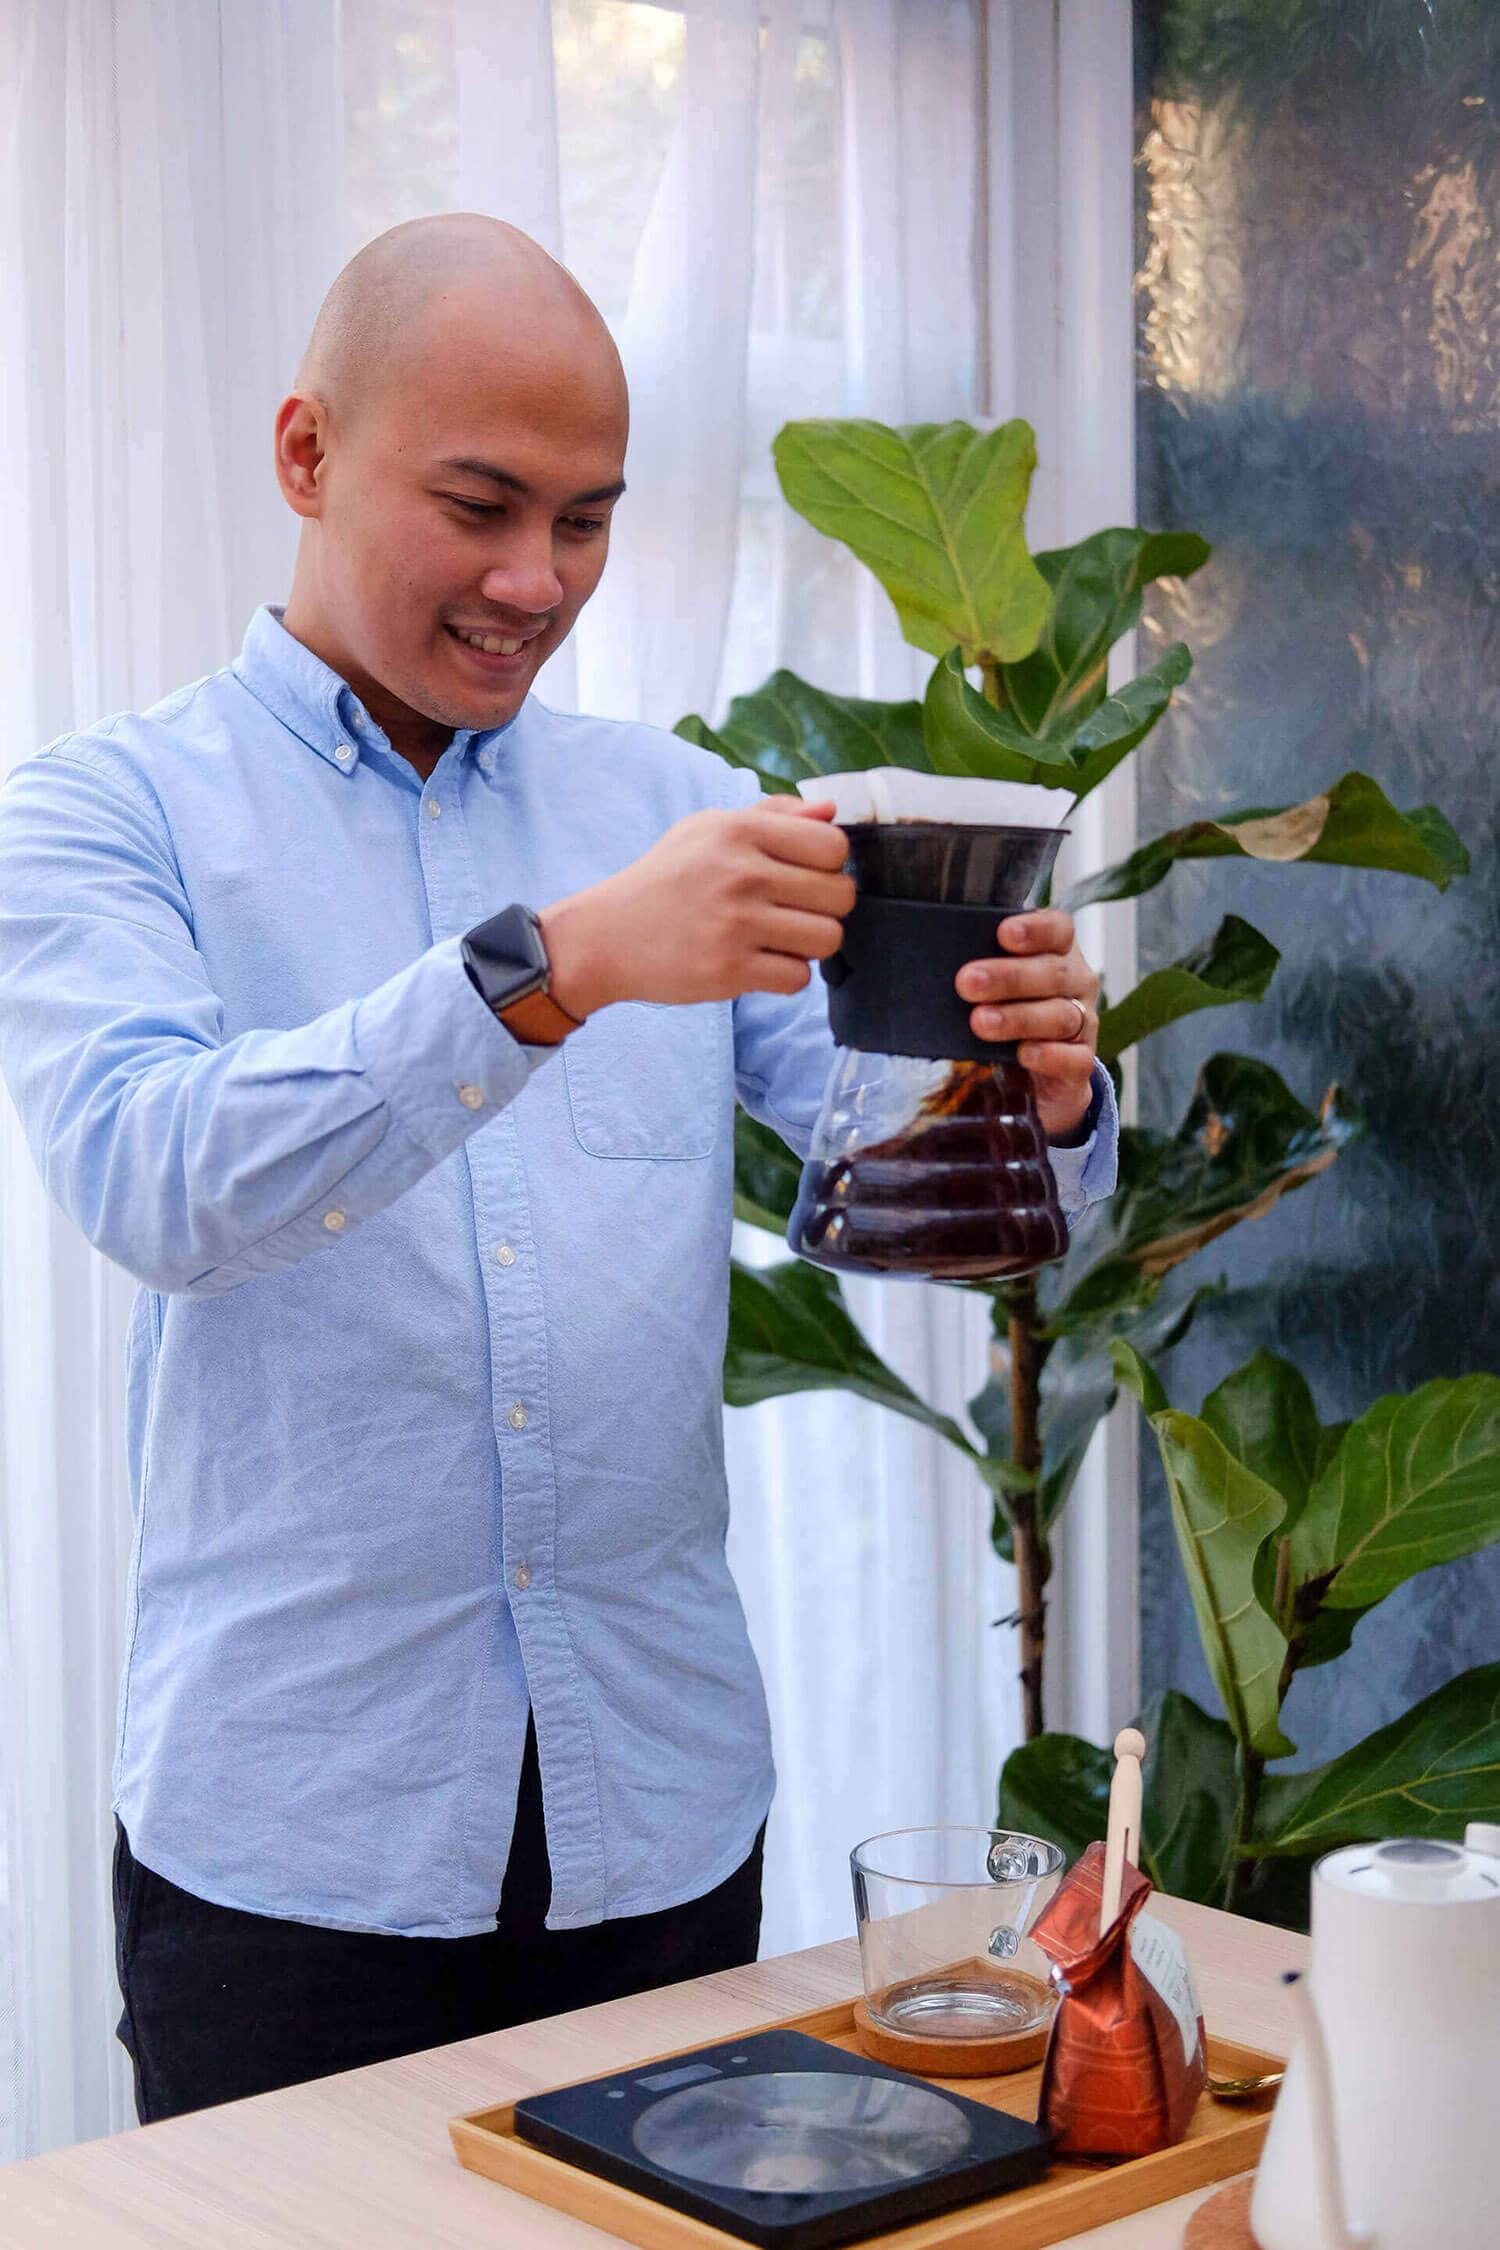 Eli brewing coffee using the Hario V60 drip method